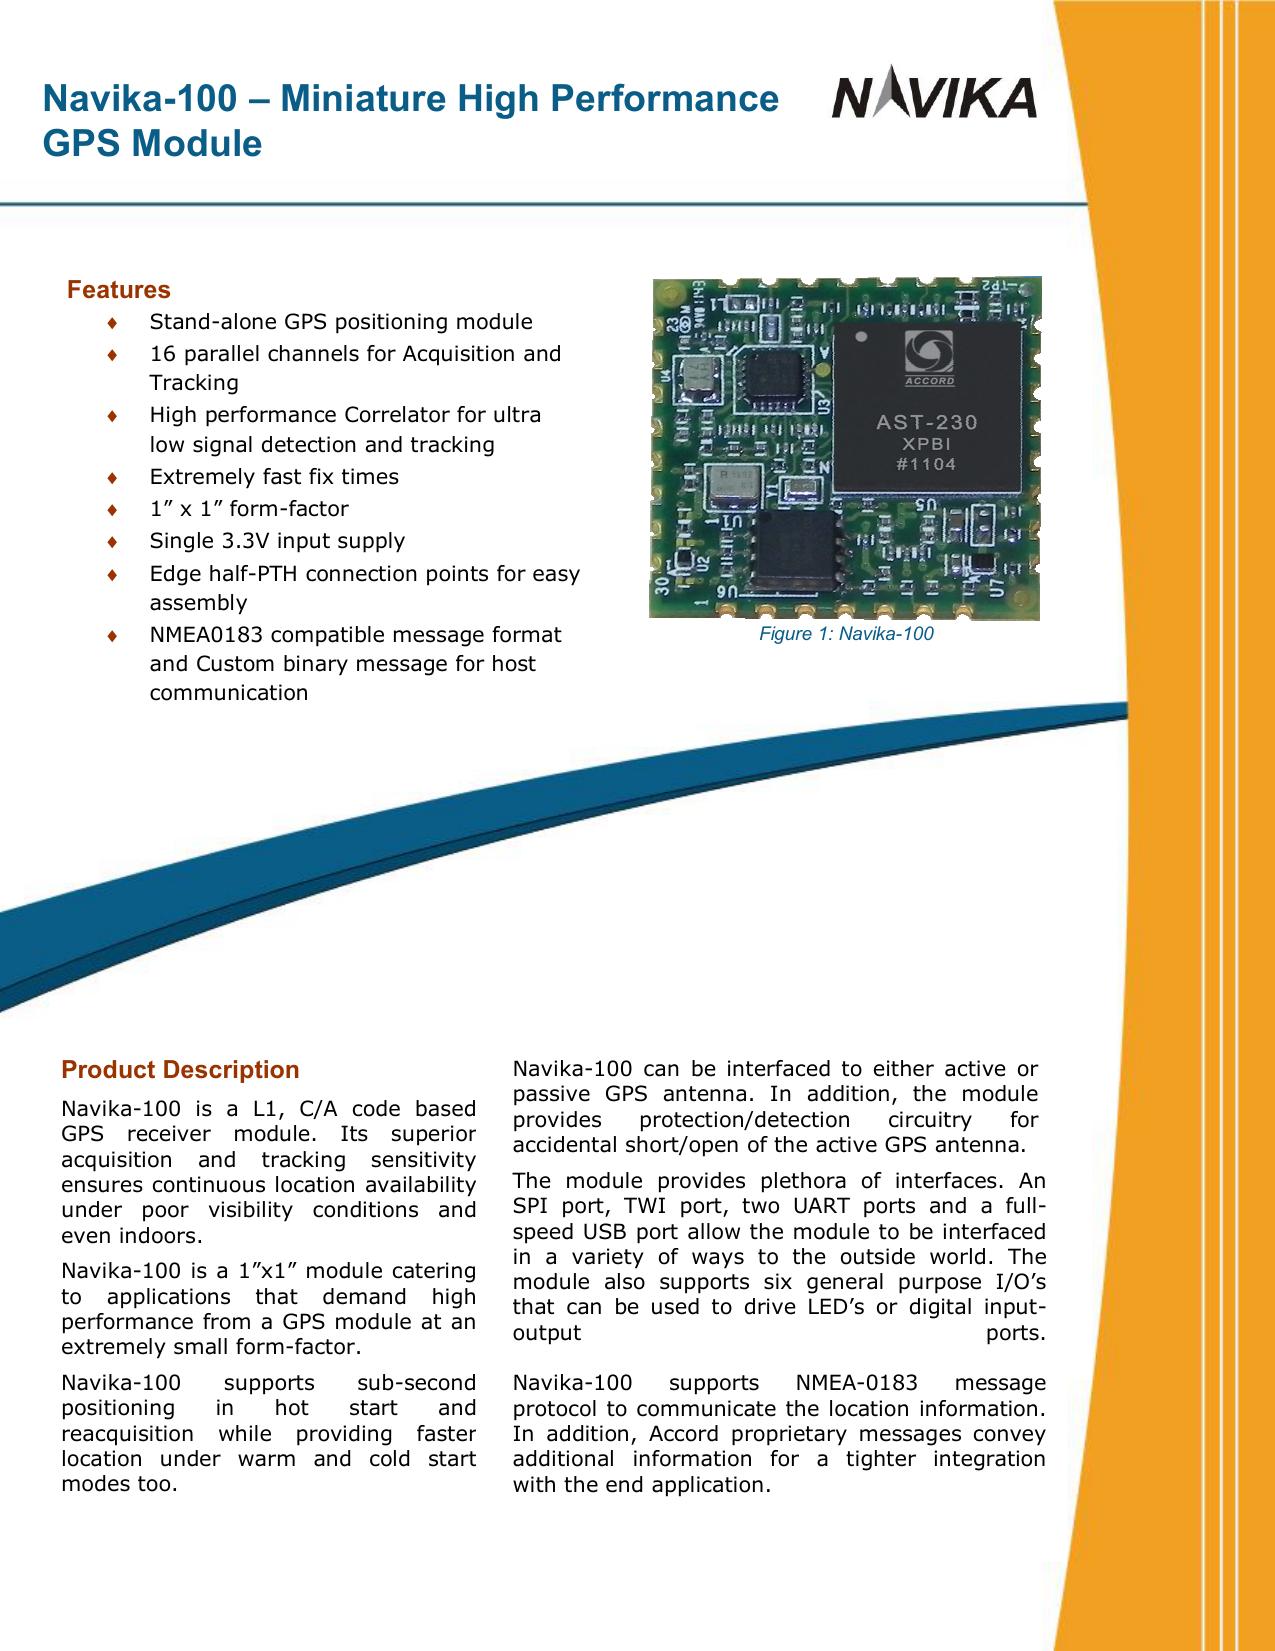 Navika-100 – Miniature High Performance GPS Module | manualzz com